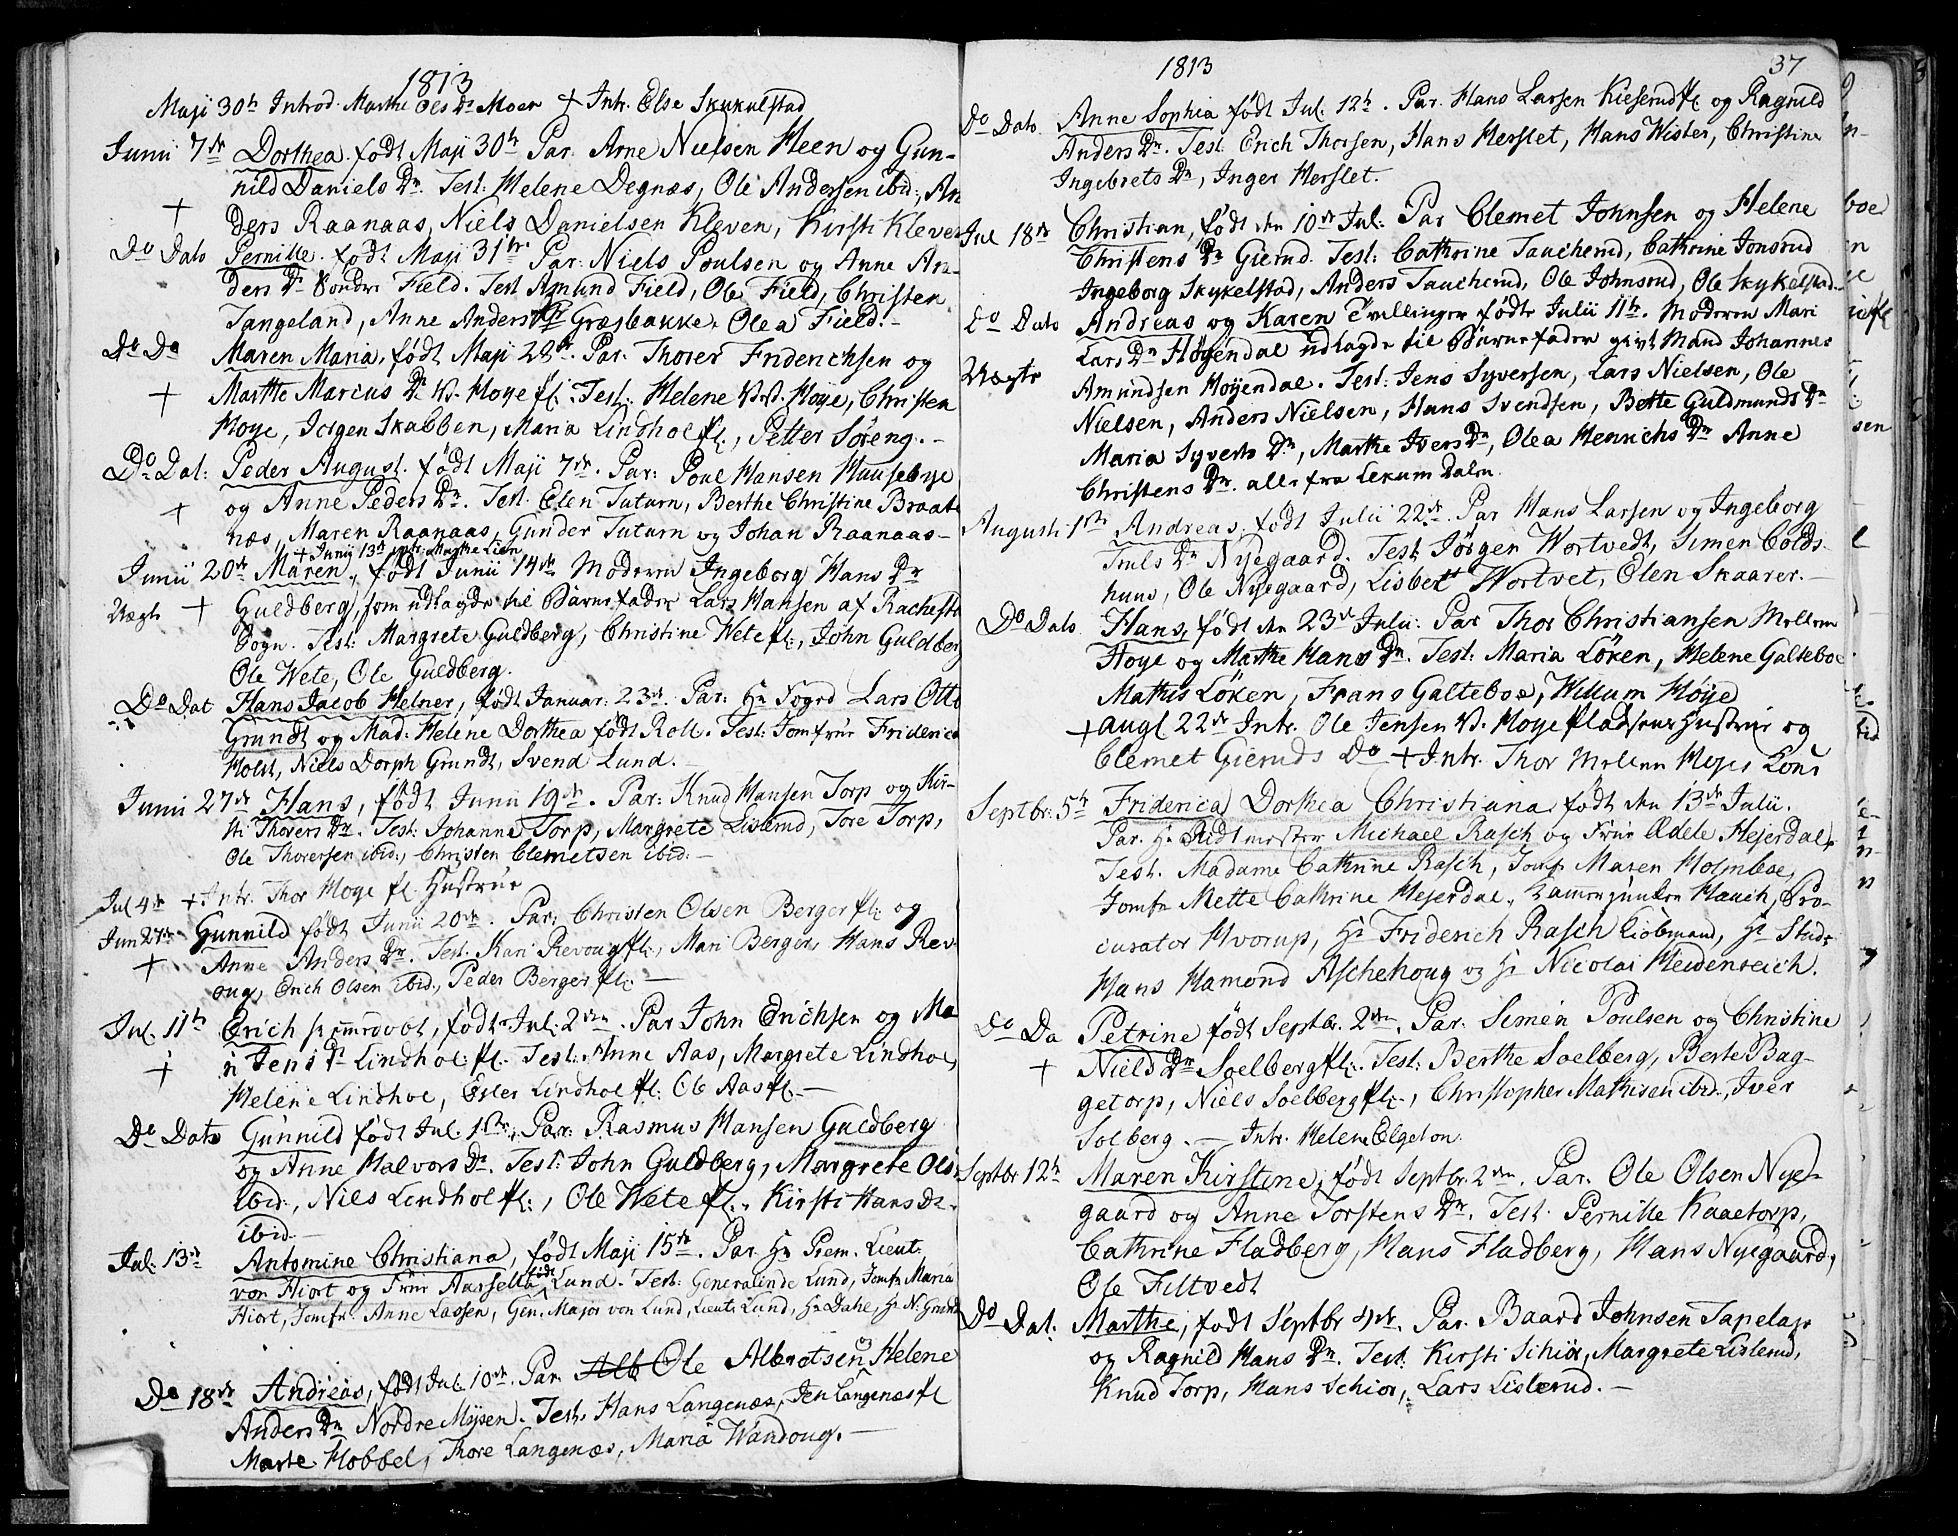 SAO, Eidsberg prestekontor Kirkebøker, F/Fa/L0006: Ministerialbok nr. I 6, 1807-1814, s. 37